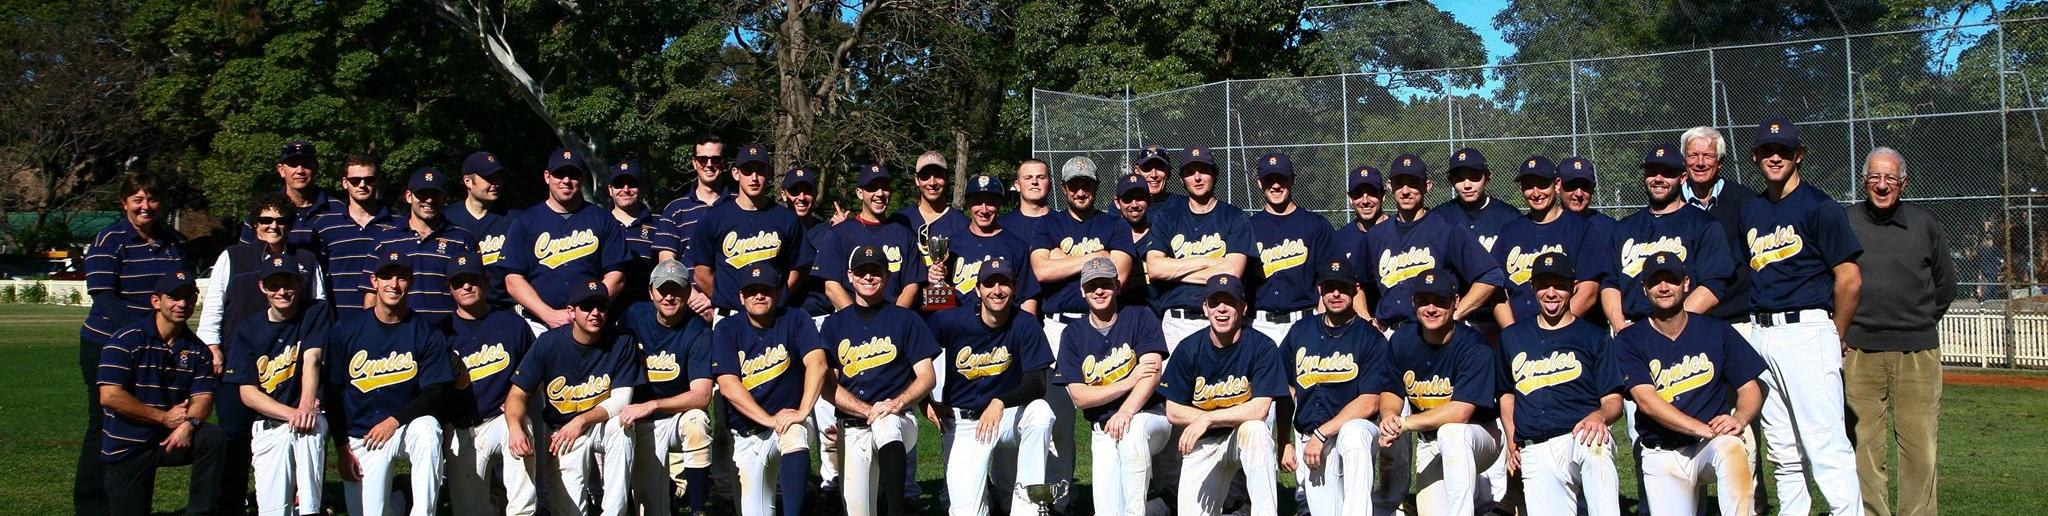 2013 SUBC Squad. The Club's Most Successful Season on Record.